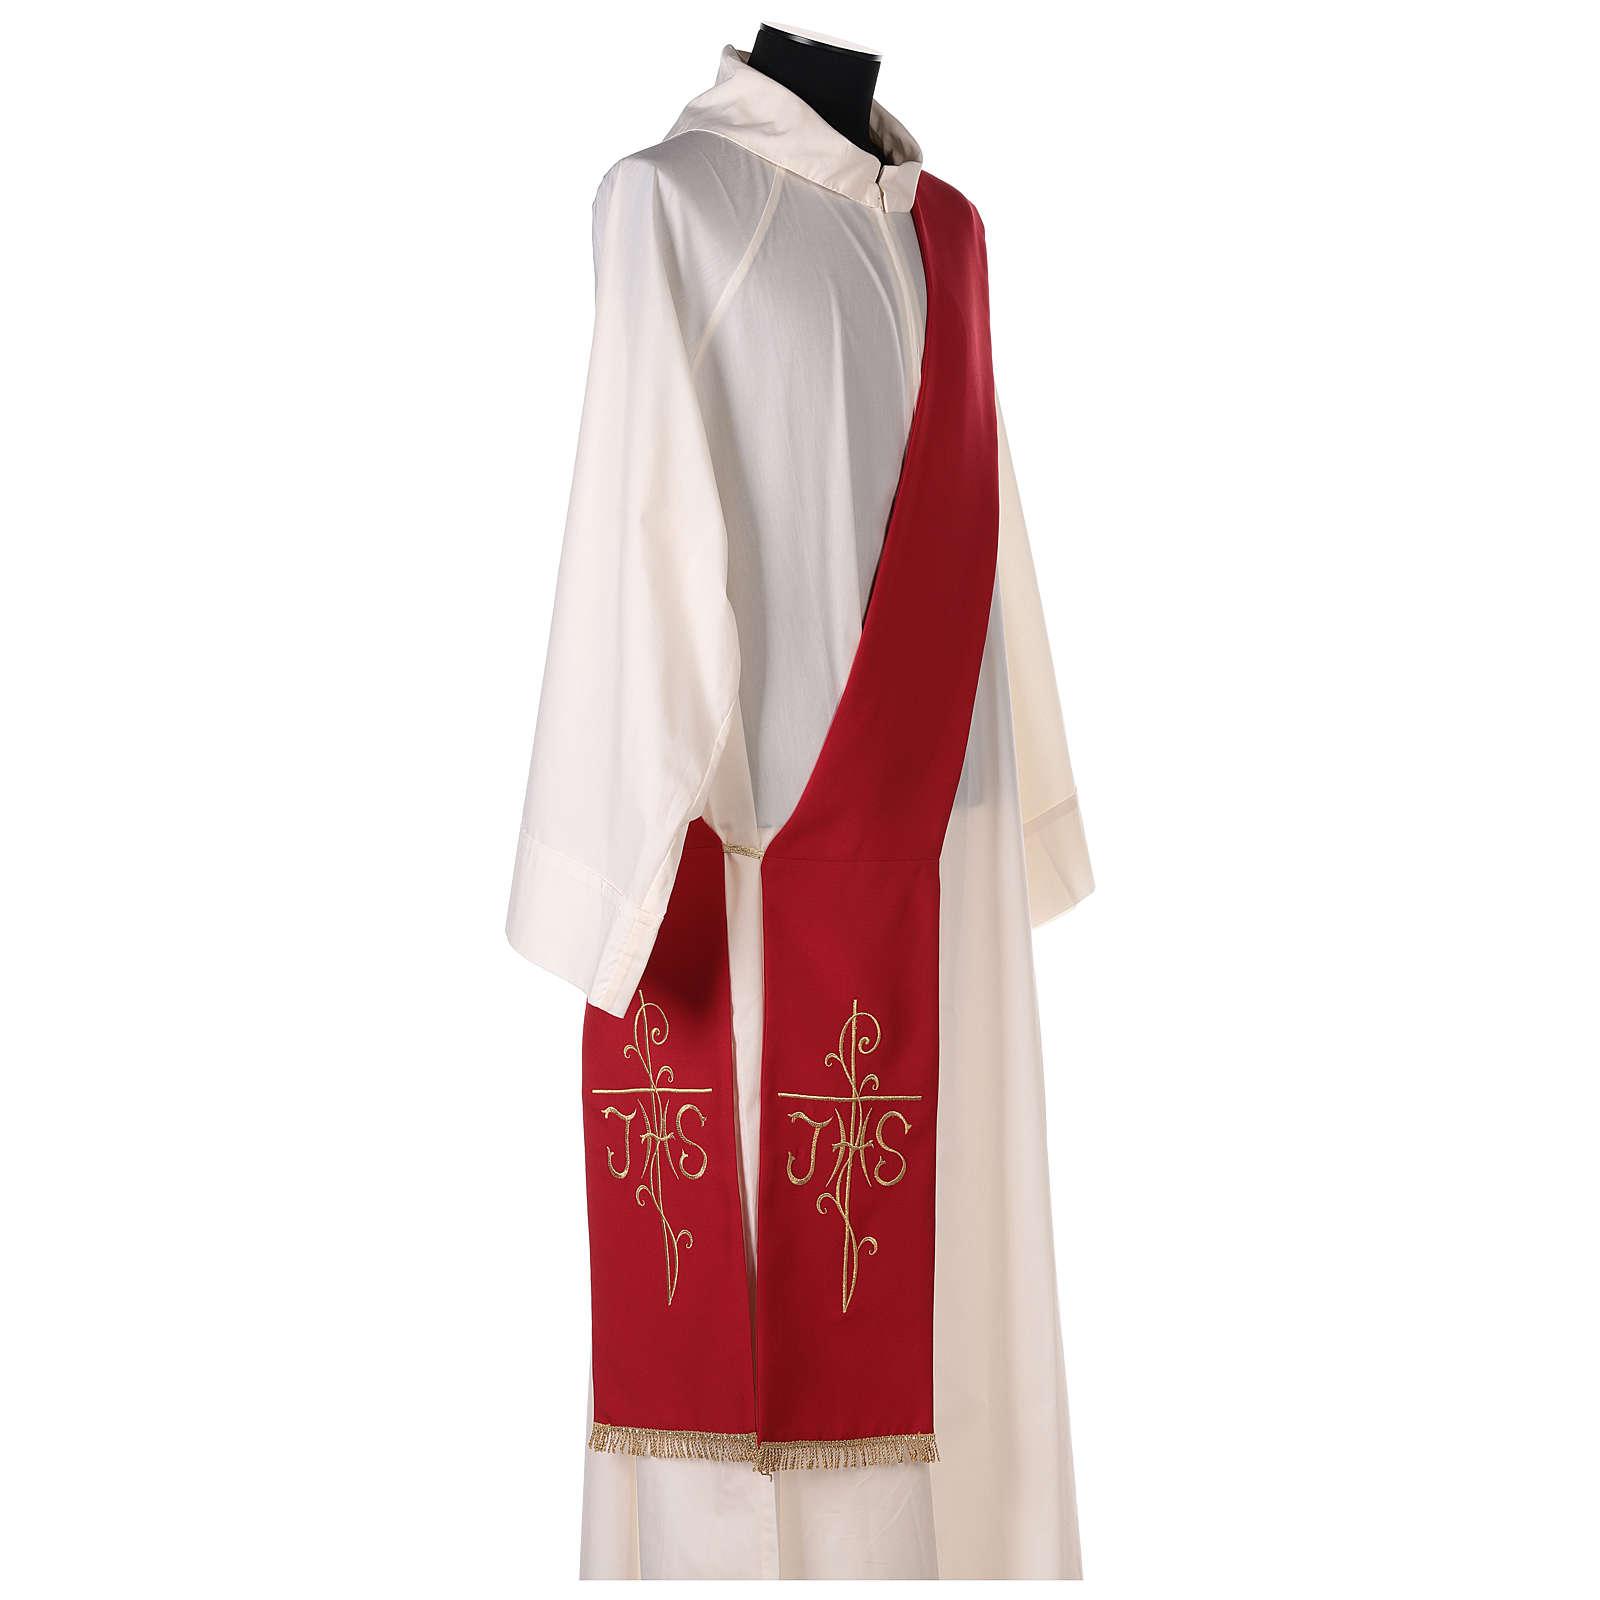 Estola diaconal bordado cruz JHS doble cara tejido Vatican 4